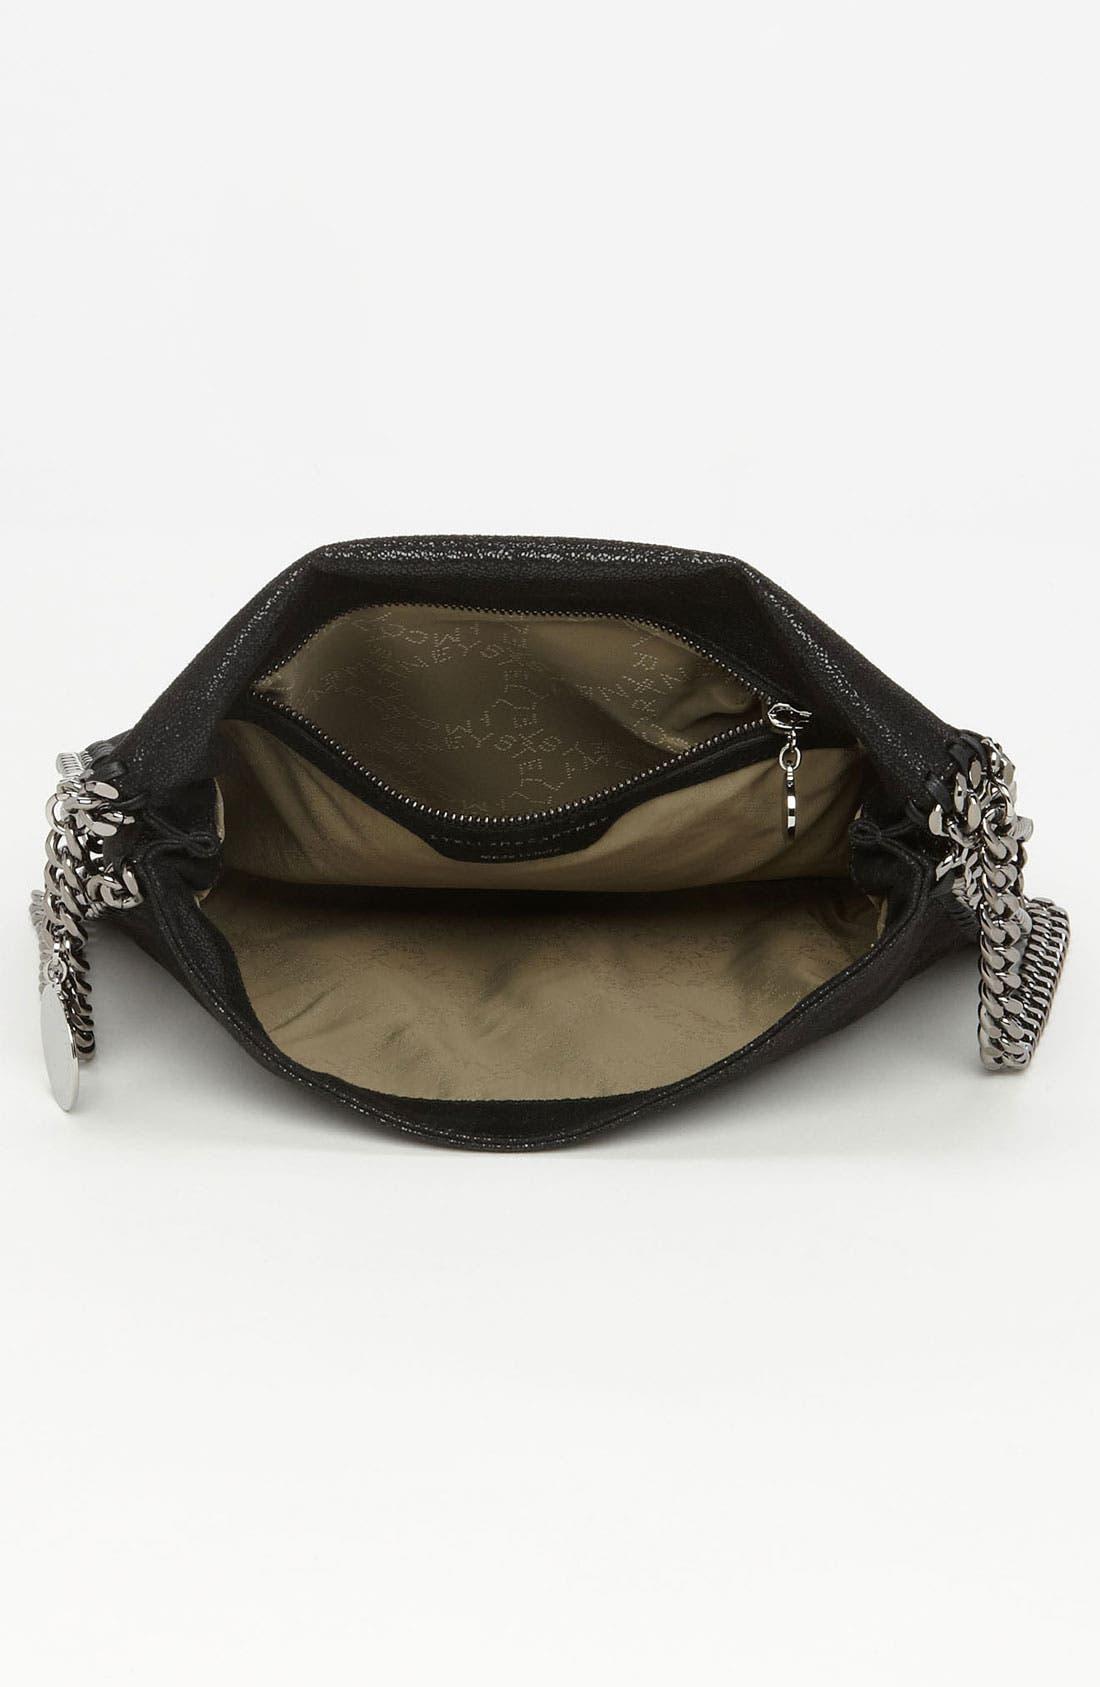 Alternate Image 3  - Stella McCartney 'Falabella' Shaggy Deer Crossbody Bag